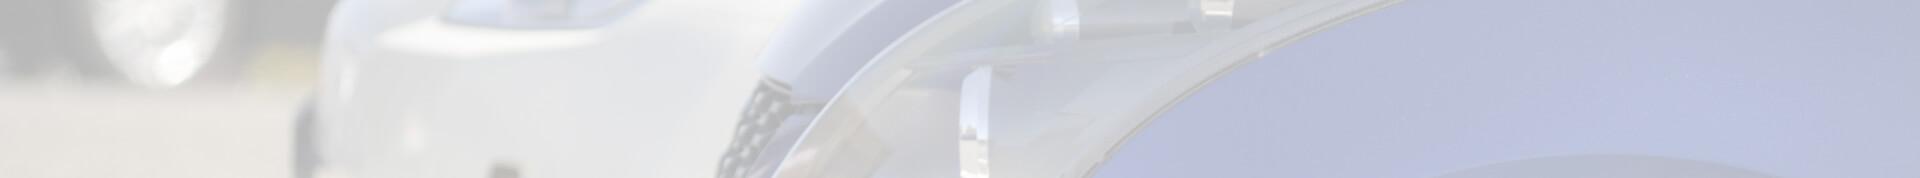 PCヘッダー画像